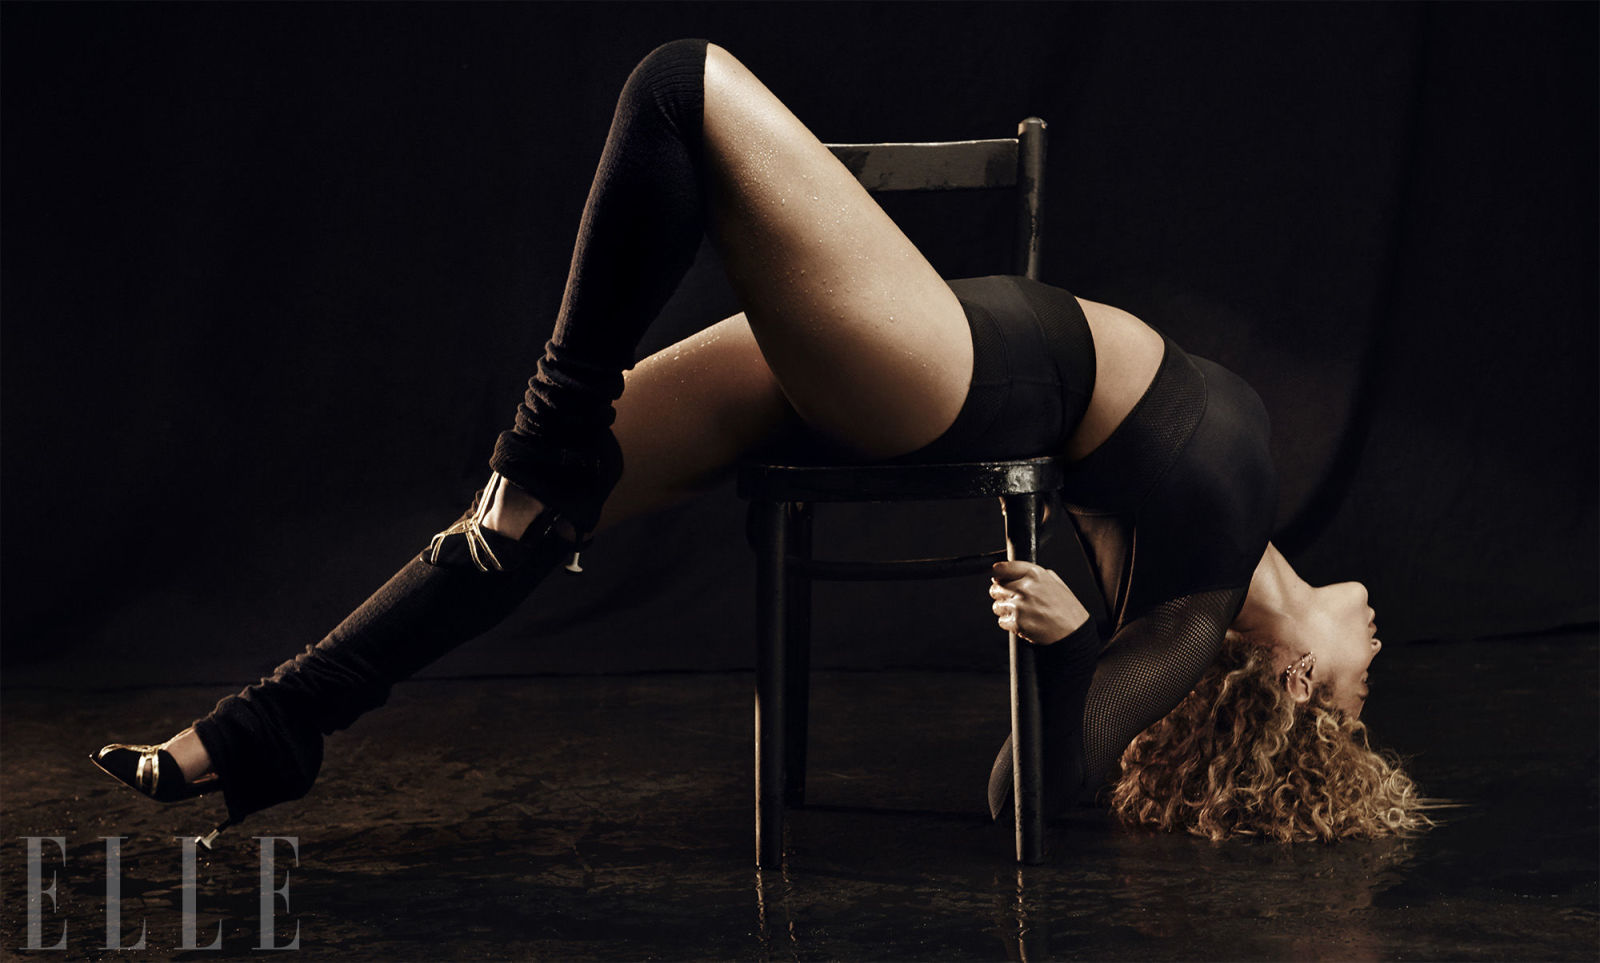 Beyoncé    Gallery-1459546263-beyonce-elle-3